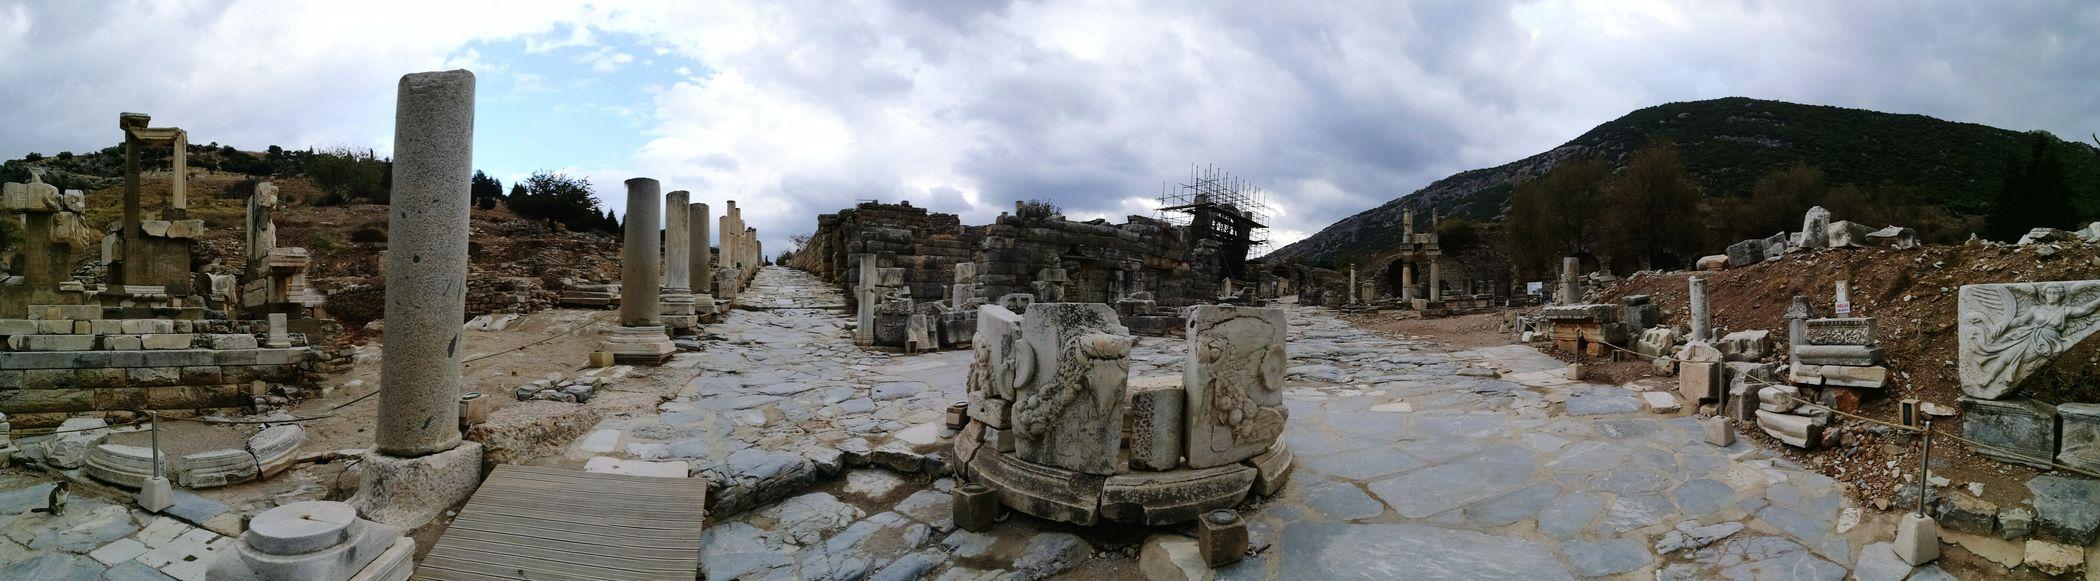 Amazing View Ephesus Ephesus Ruins Roman History Turkey Exciting Ephesus - Turkey Greek History Helenistik Wonderful View